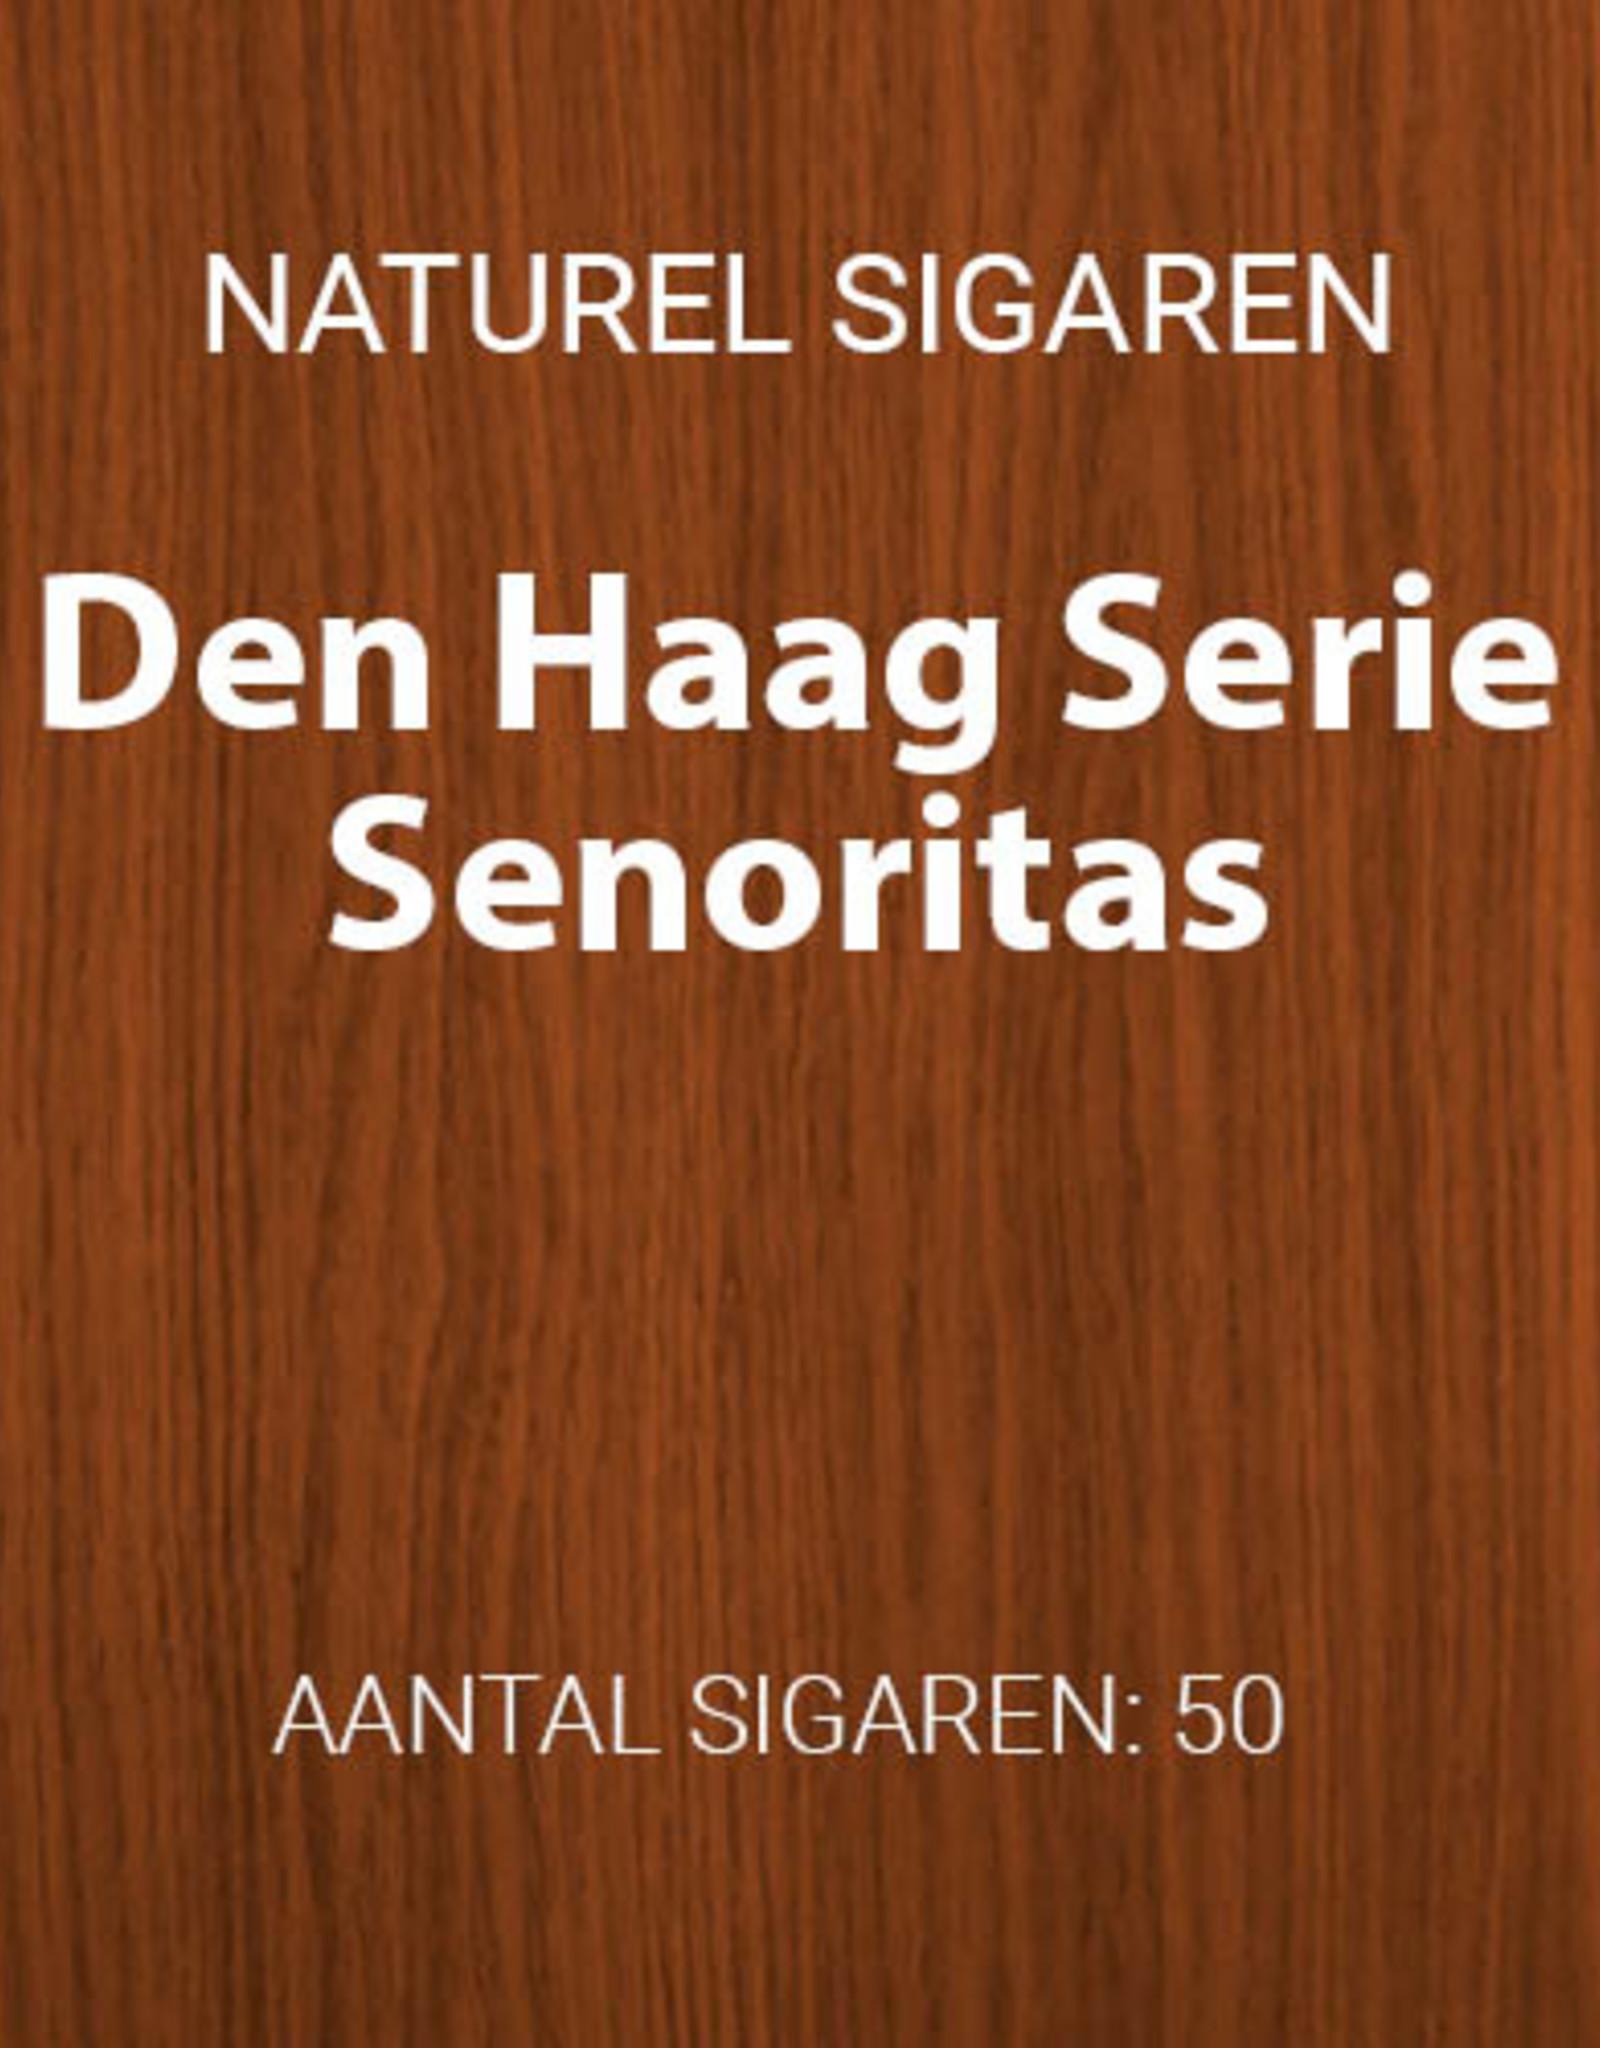 Den Haag Serie Senoritas Naturel